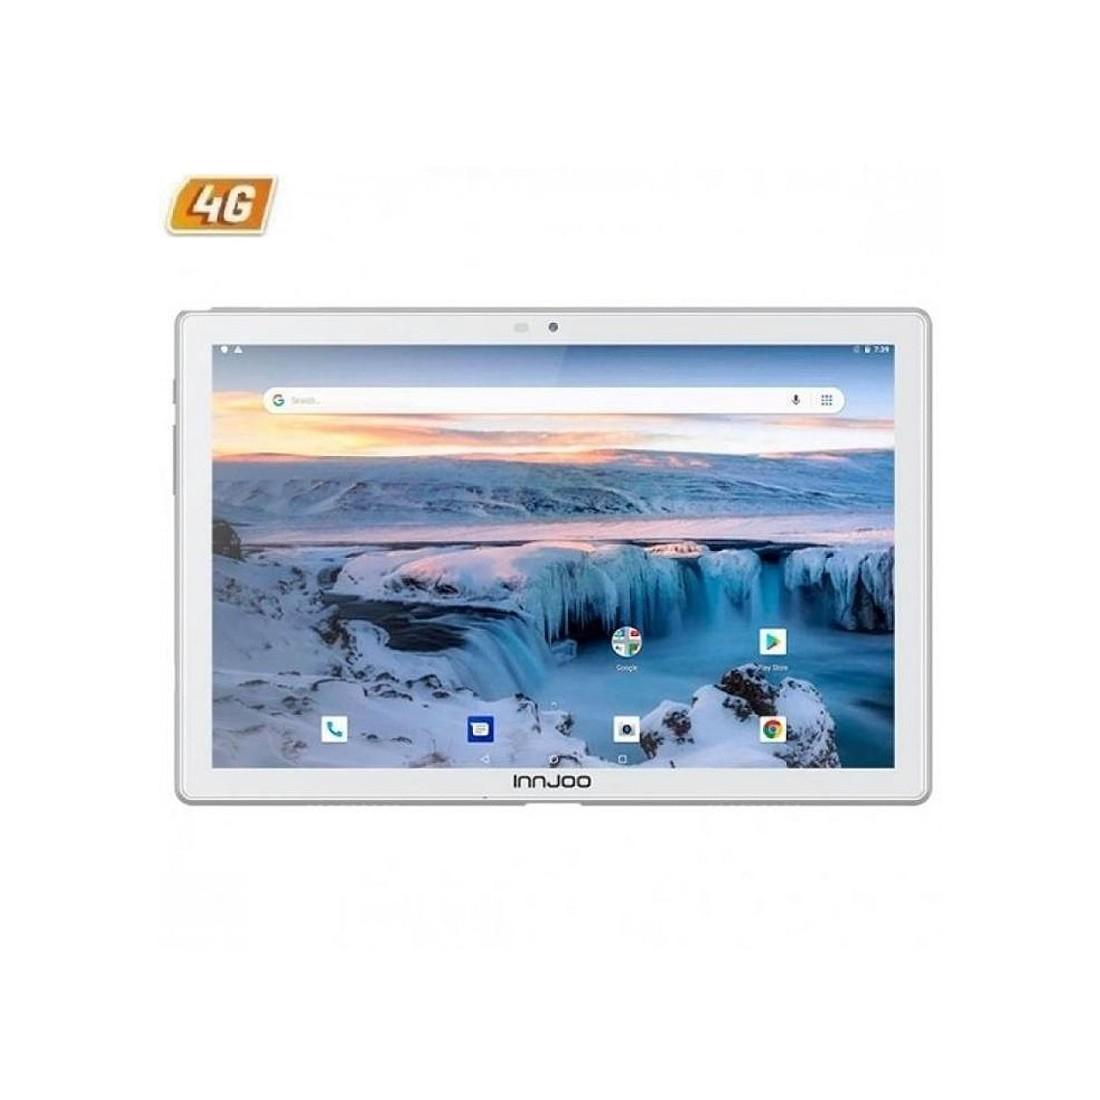 "Tablet INNJOO VOOM TAB 10.1"", 4Gm RAM, 64Gb memoria interna, 4G, color Blanco"